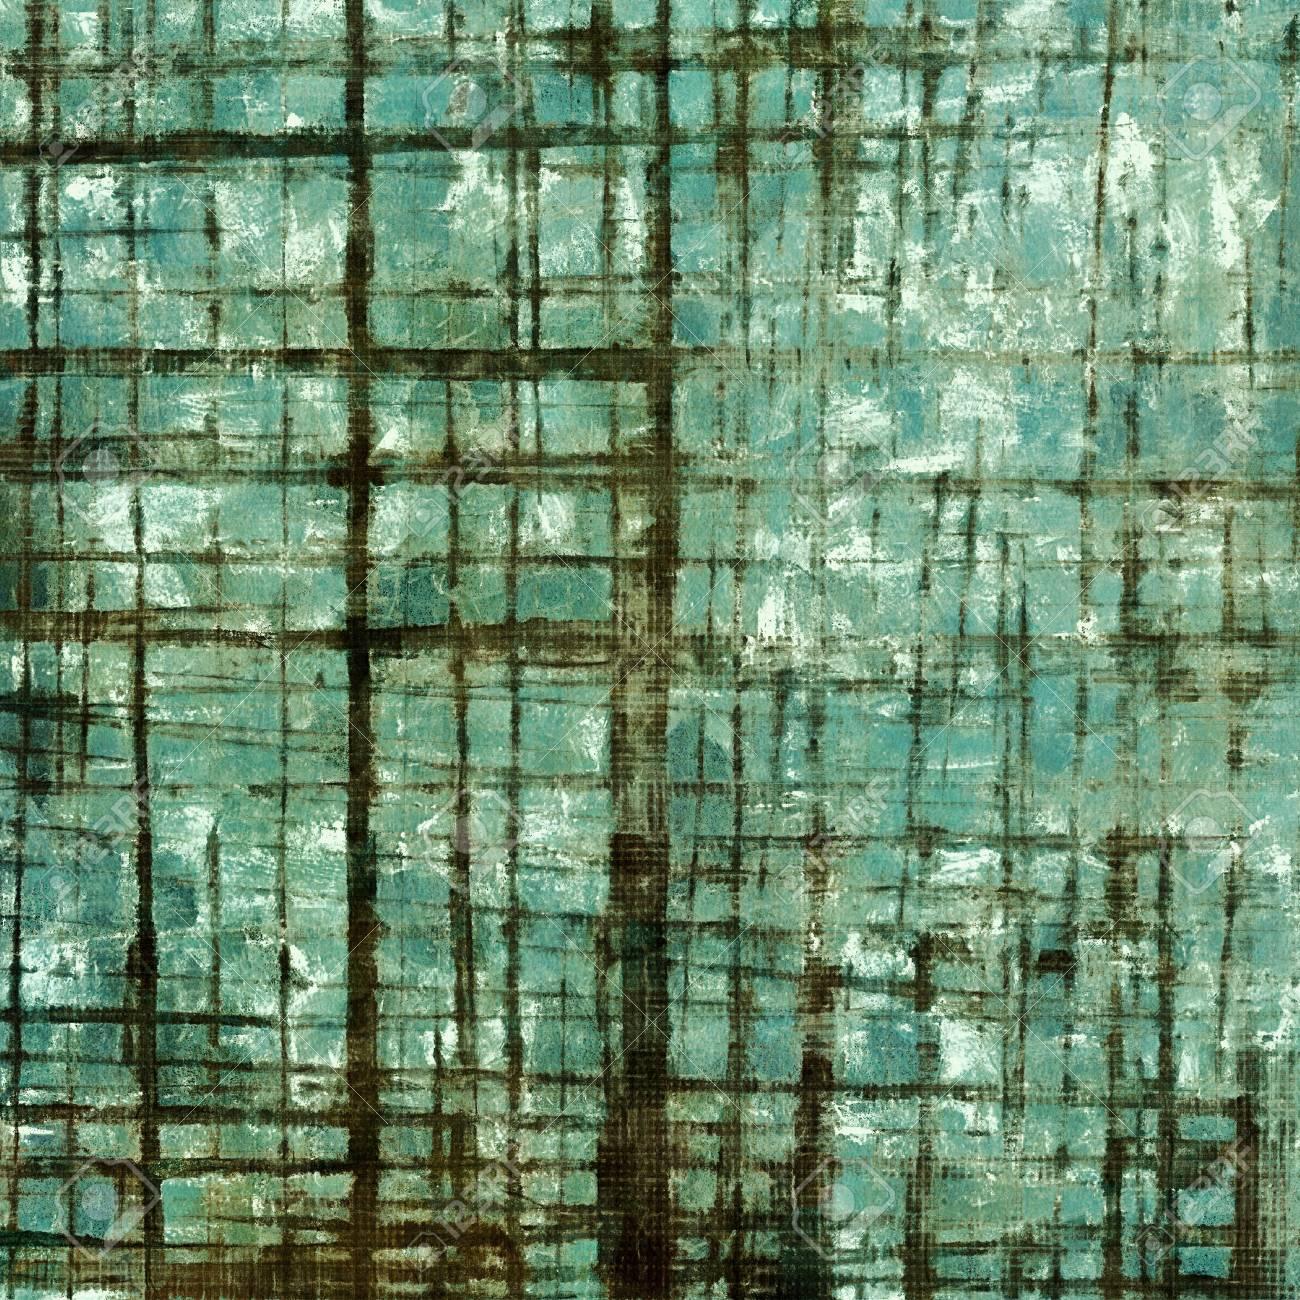 3fdaa50986c5d Fundo abstrato do grunge ou textura danificada do vintage. Com diferentes  padrões de cores